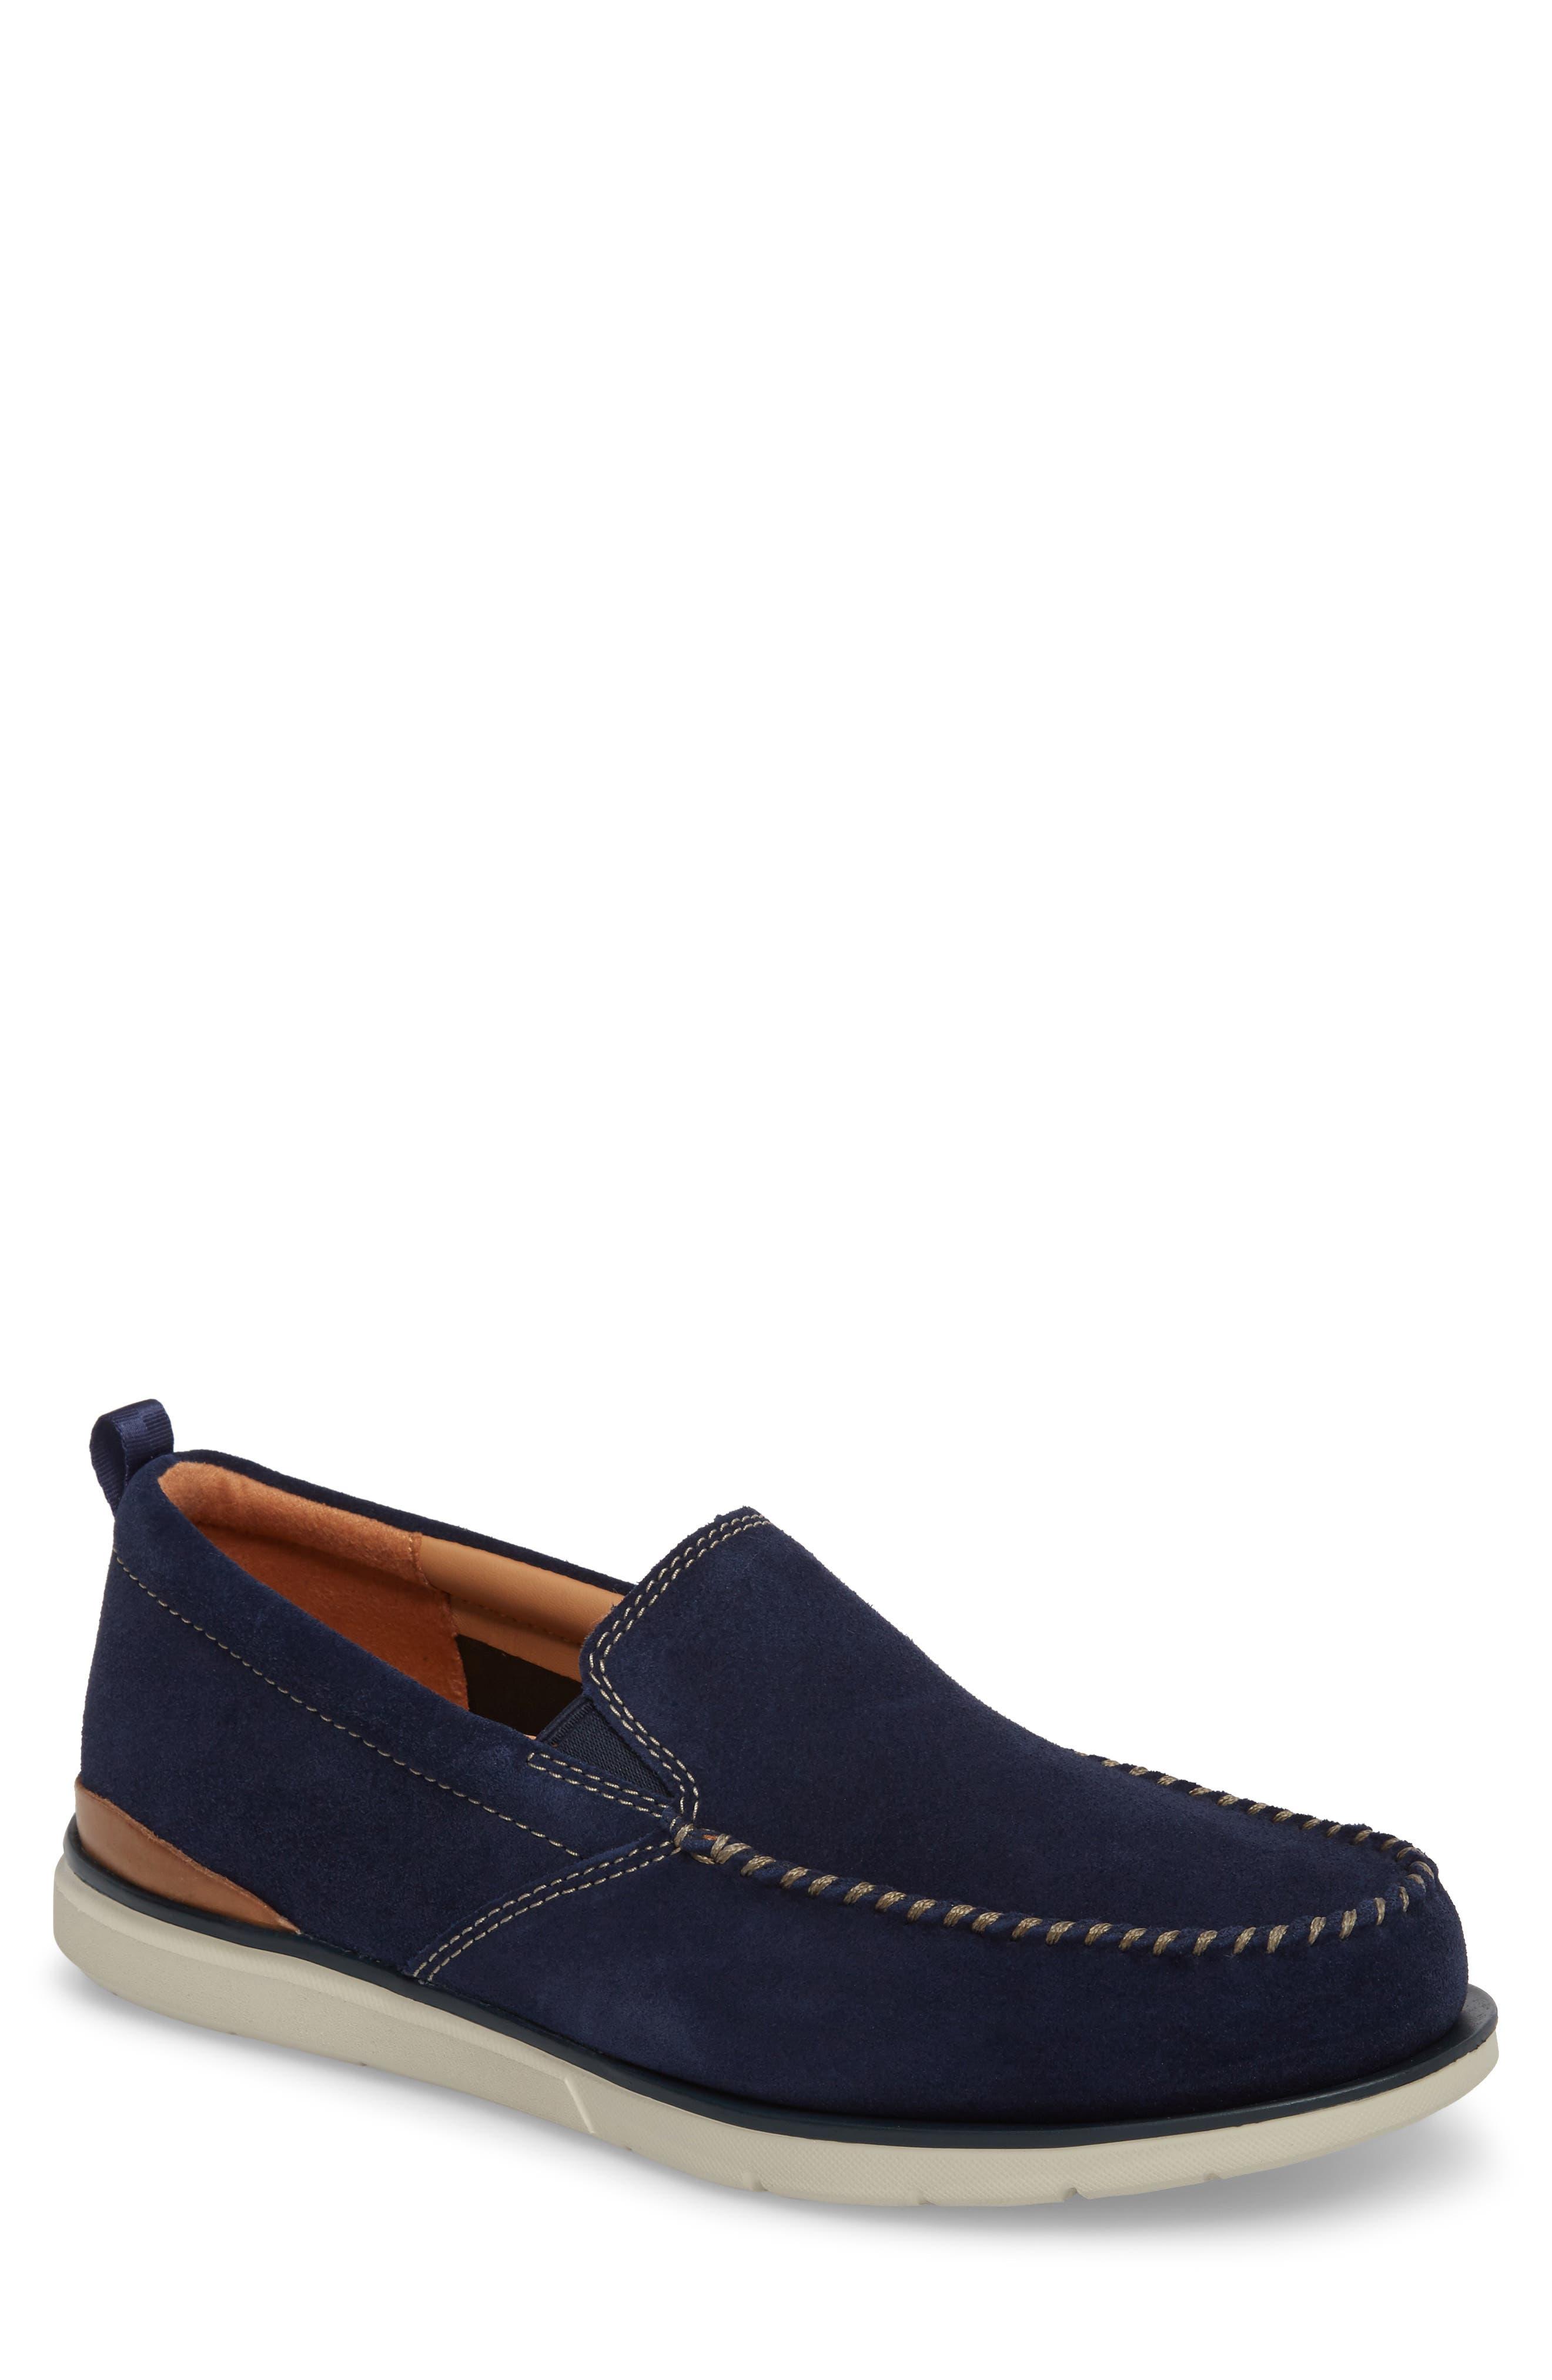 Edgewood Step Moc Toe Loafer,                         Main,                         color, Blue Suede